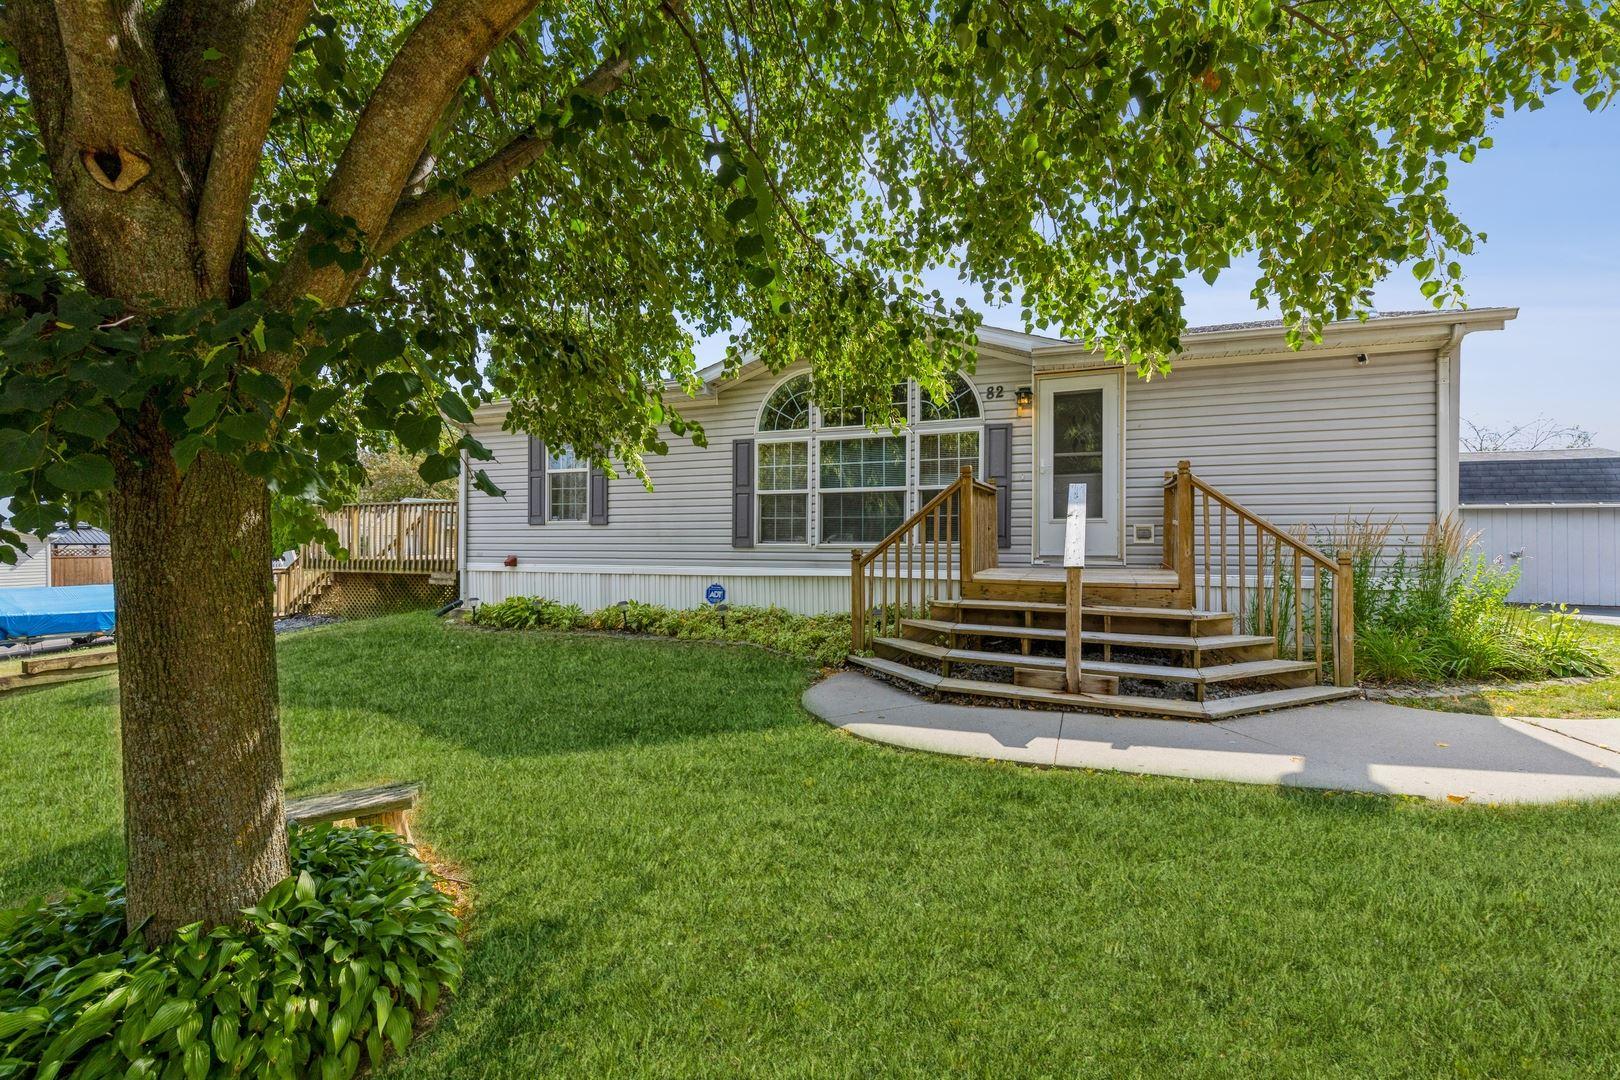 82 Sandbar Street, Lakemoor, IL 60051 - #: 11179214